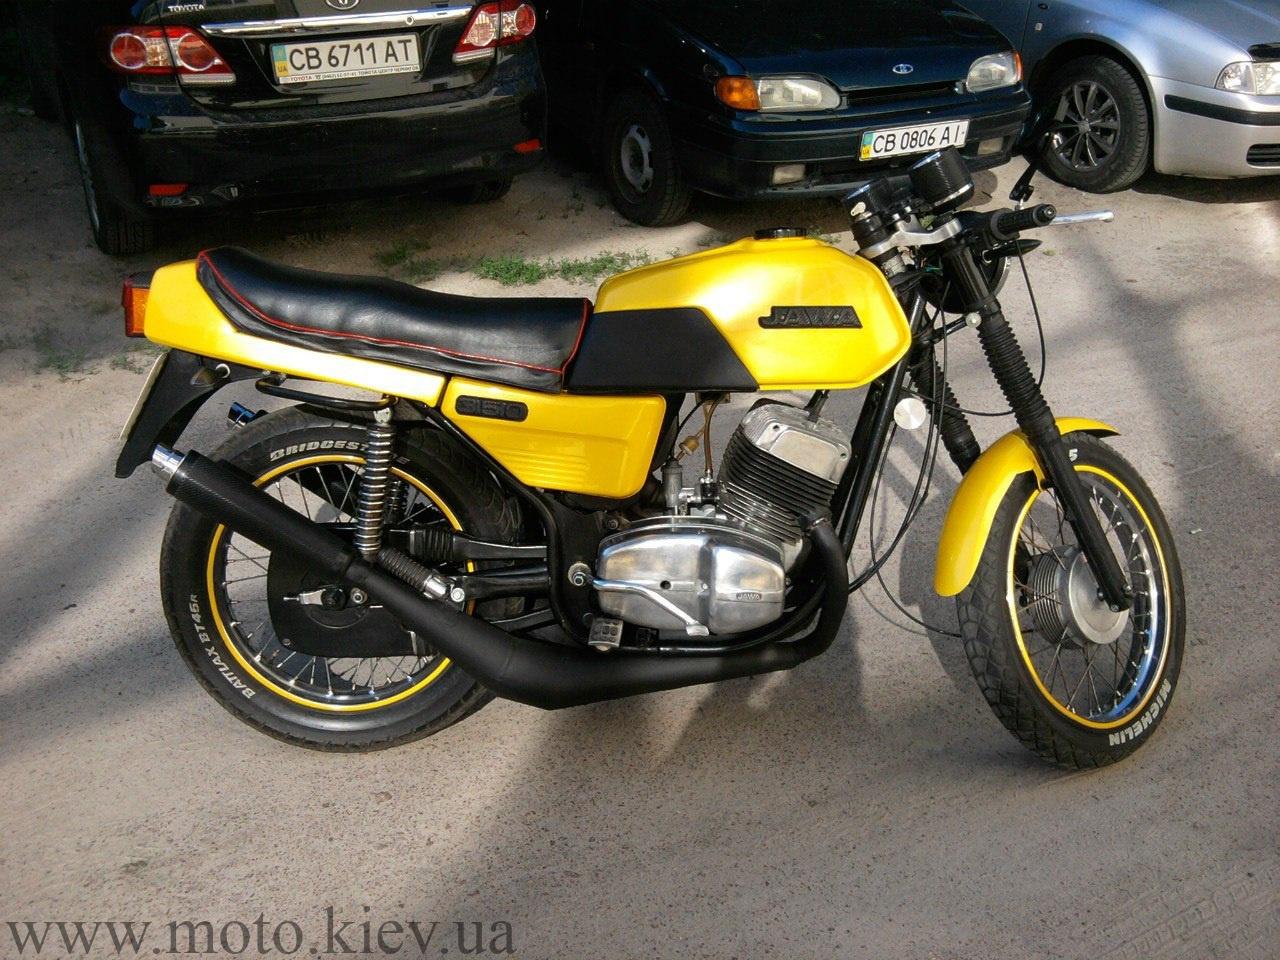 Мотоцикл Ява : тюнинг. Ява 350 : способы улучшения 358